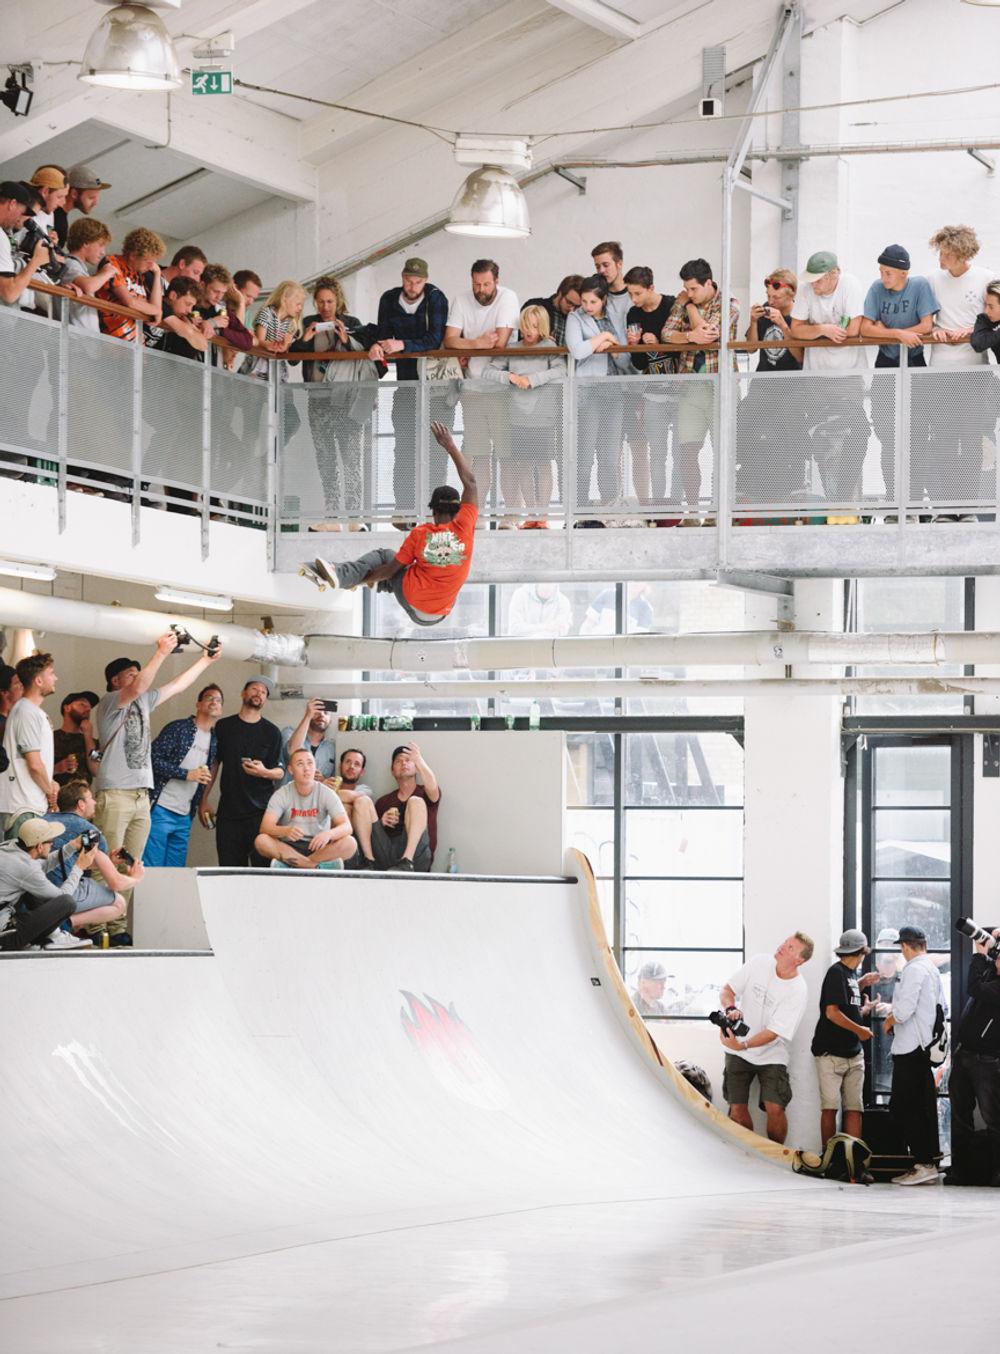 _IHC4845e-Fernando-Bramsmark-Stalefish-Nike-SB-Copenhagen-Open-Day-3-July-2015-Photographer-Maksim-Kalanep